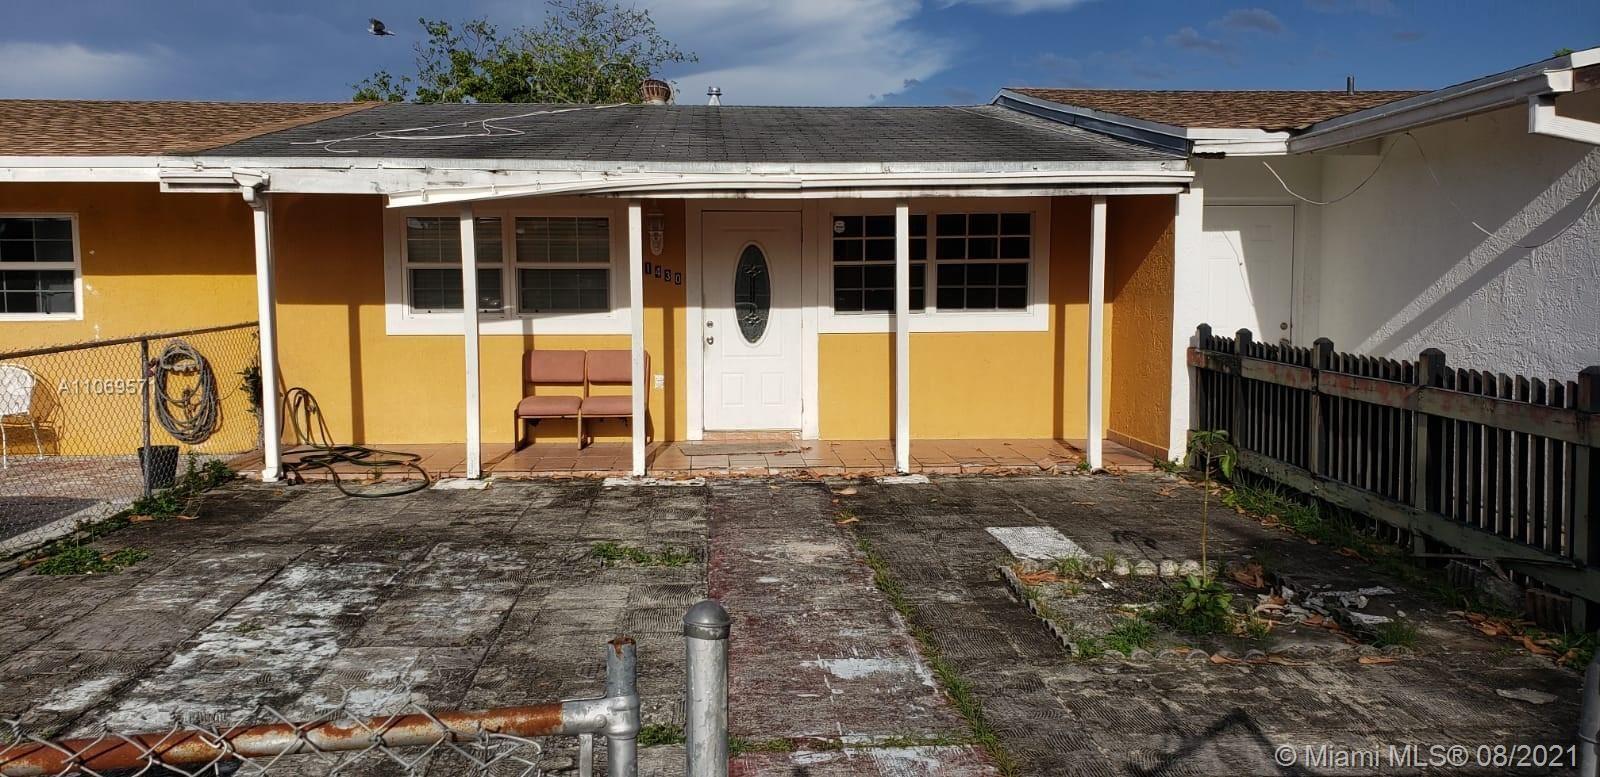 21430 NW 40th Cir Ct #0, Miami Gardens, FL 33055 - #: A11069571